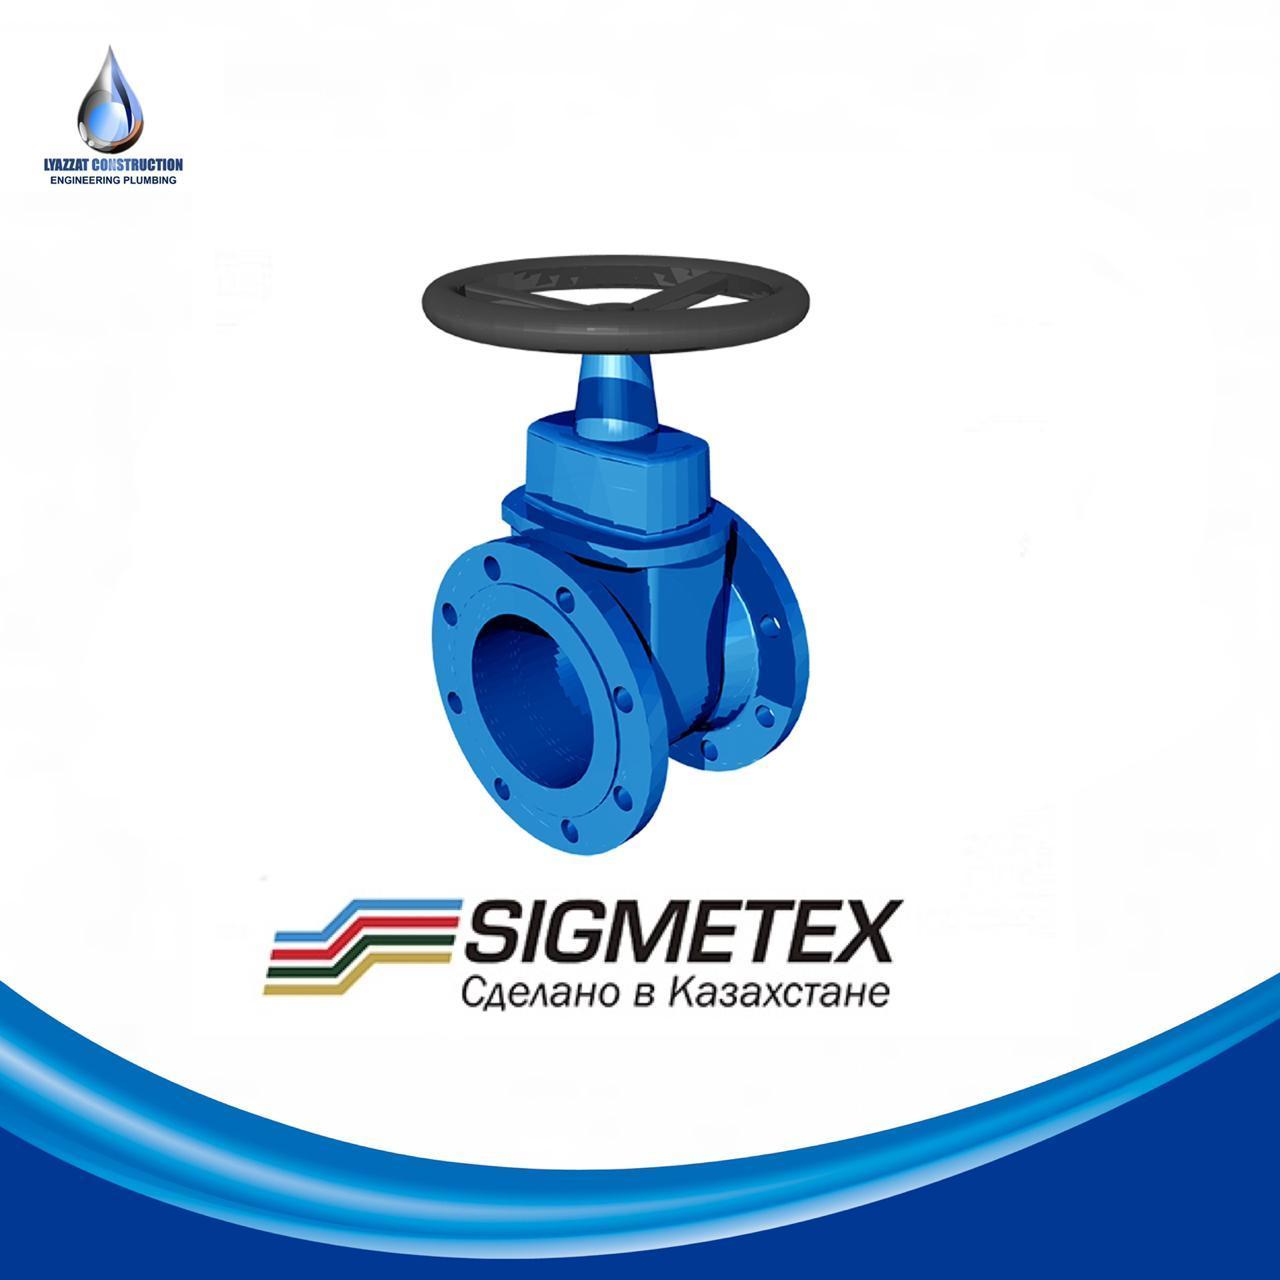 Задвижка Sigmetex DN 65 (Сигметэкс)